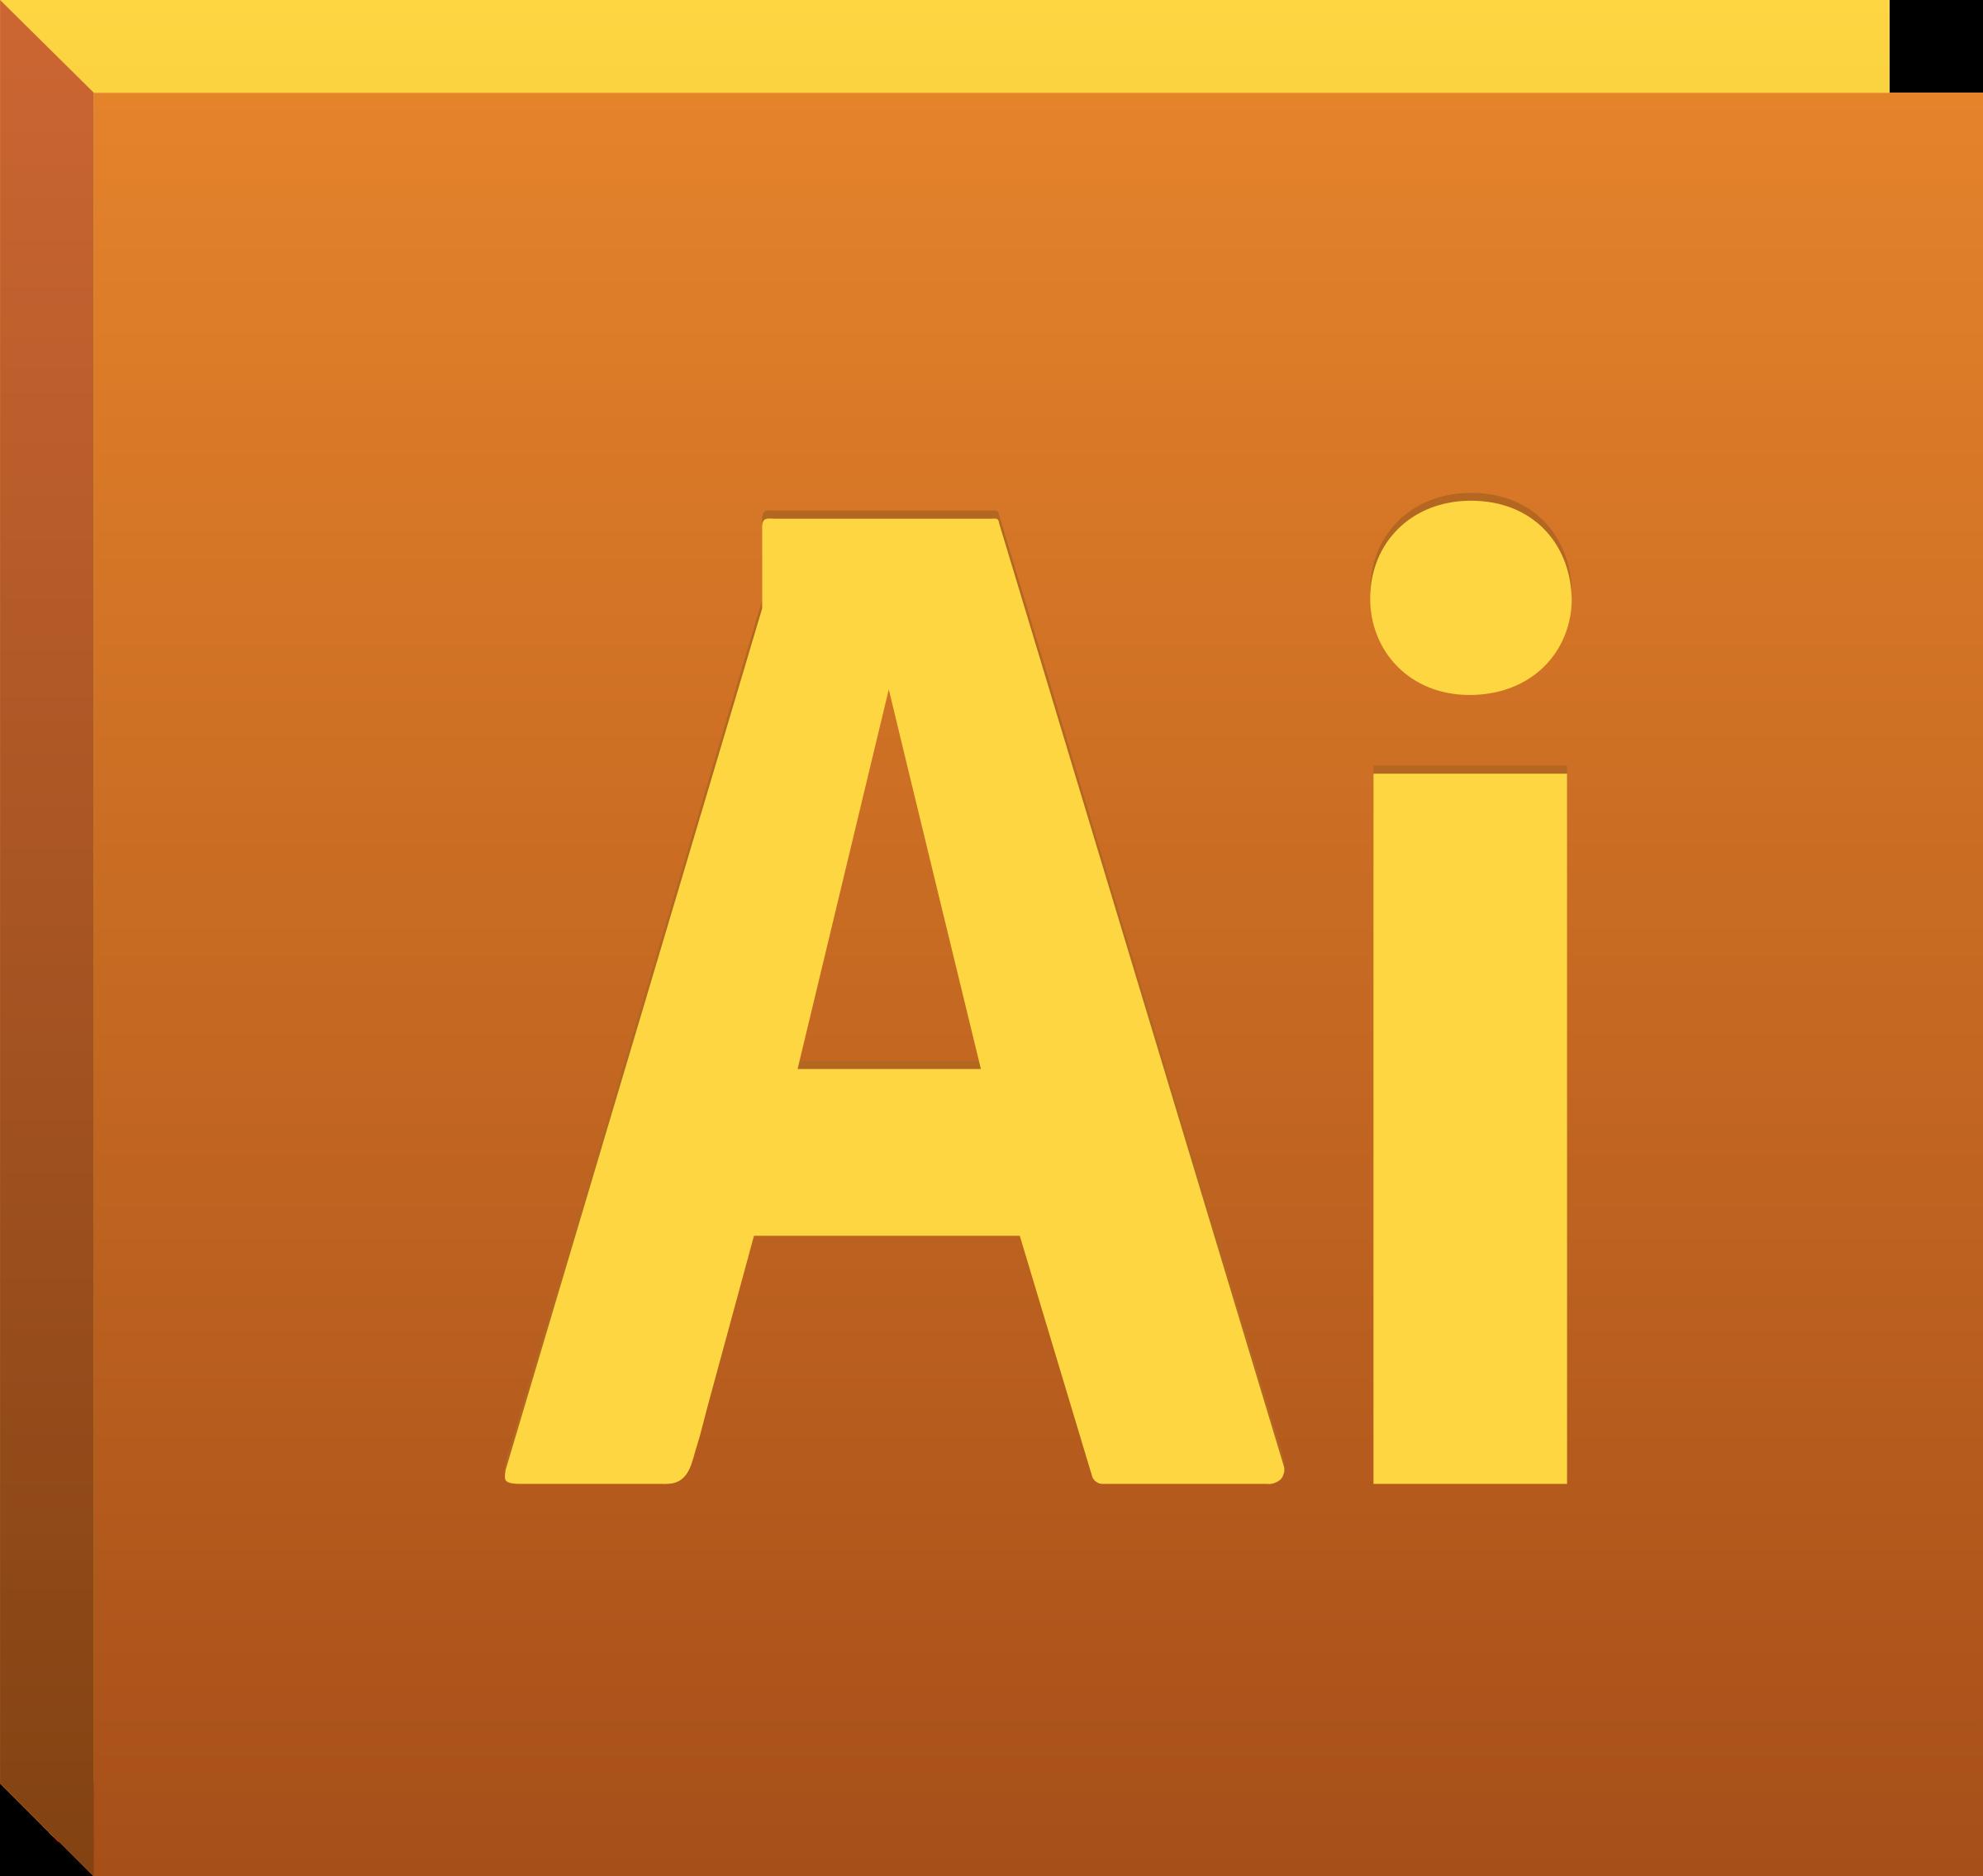 Adobe Illustrator CS5 Logo PNG Transparent & SVG Vector.